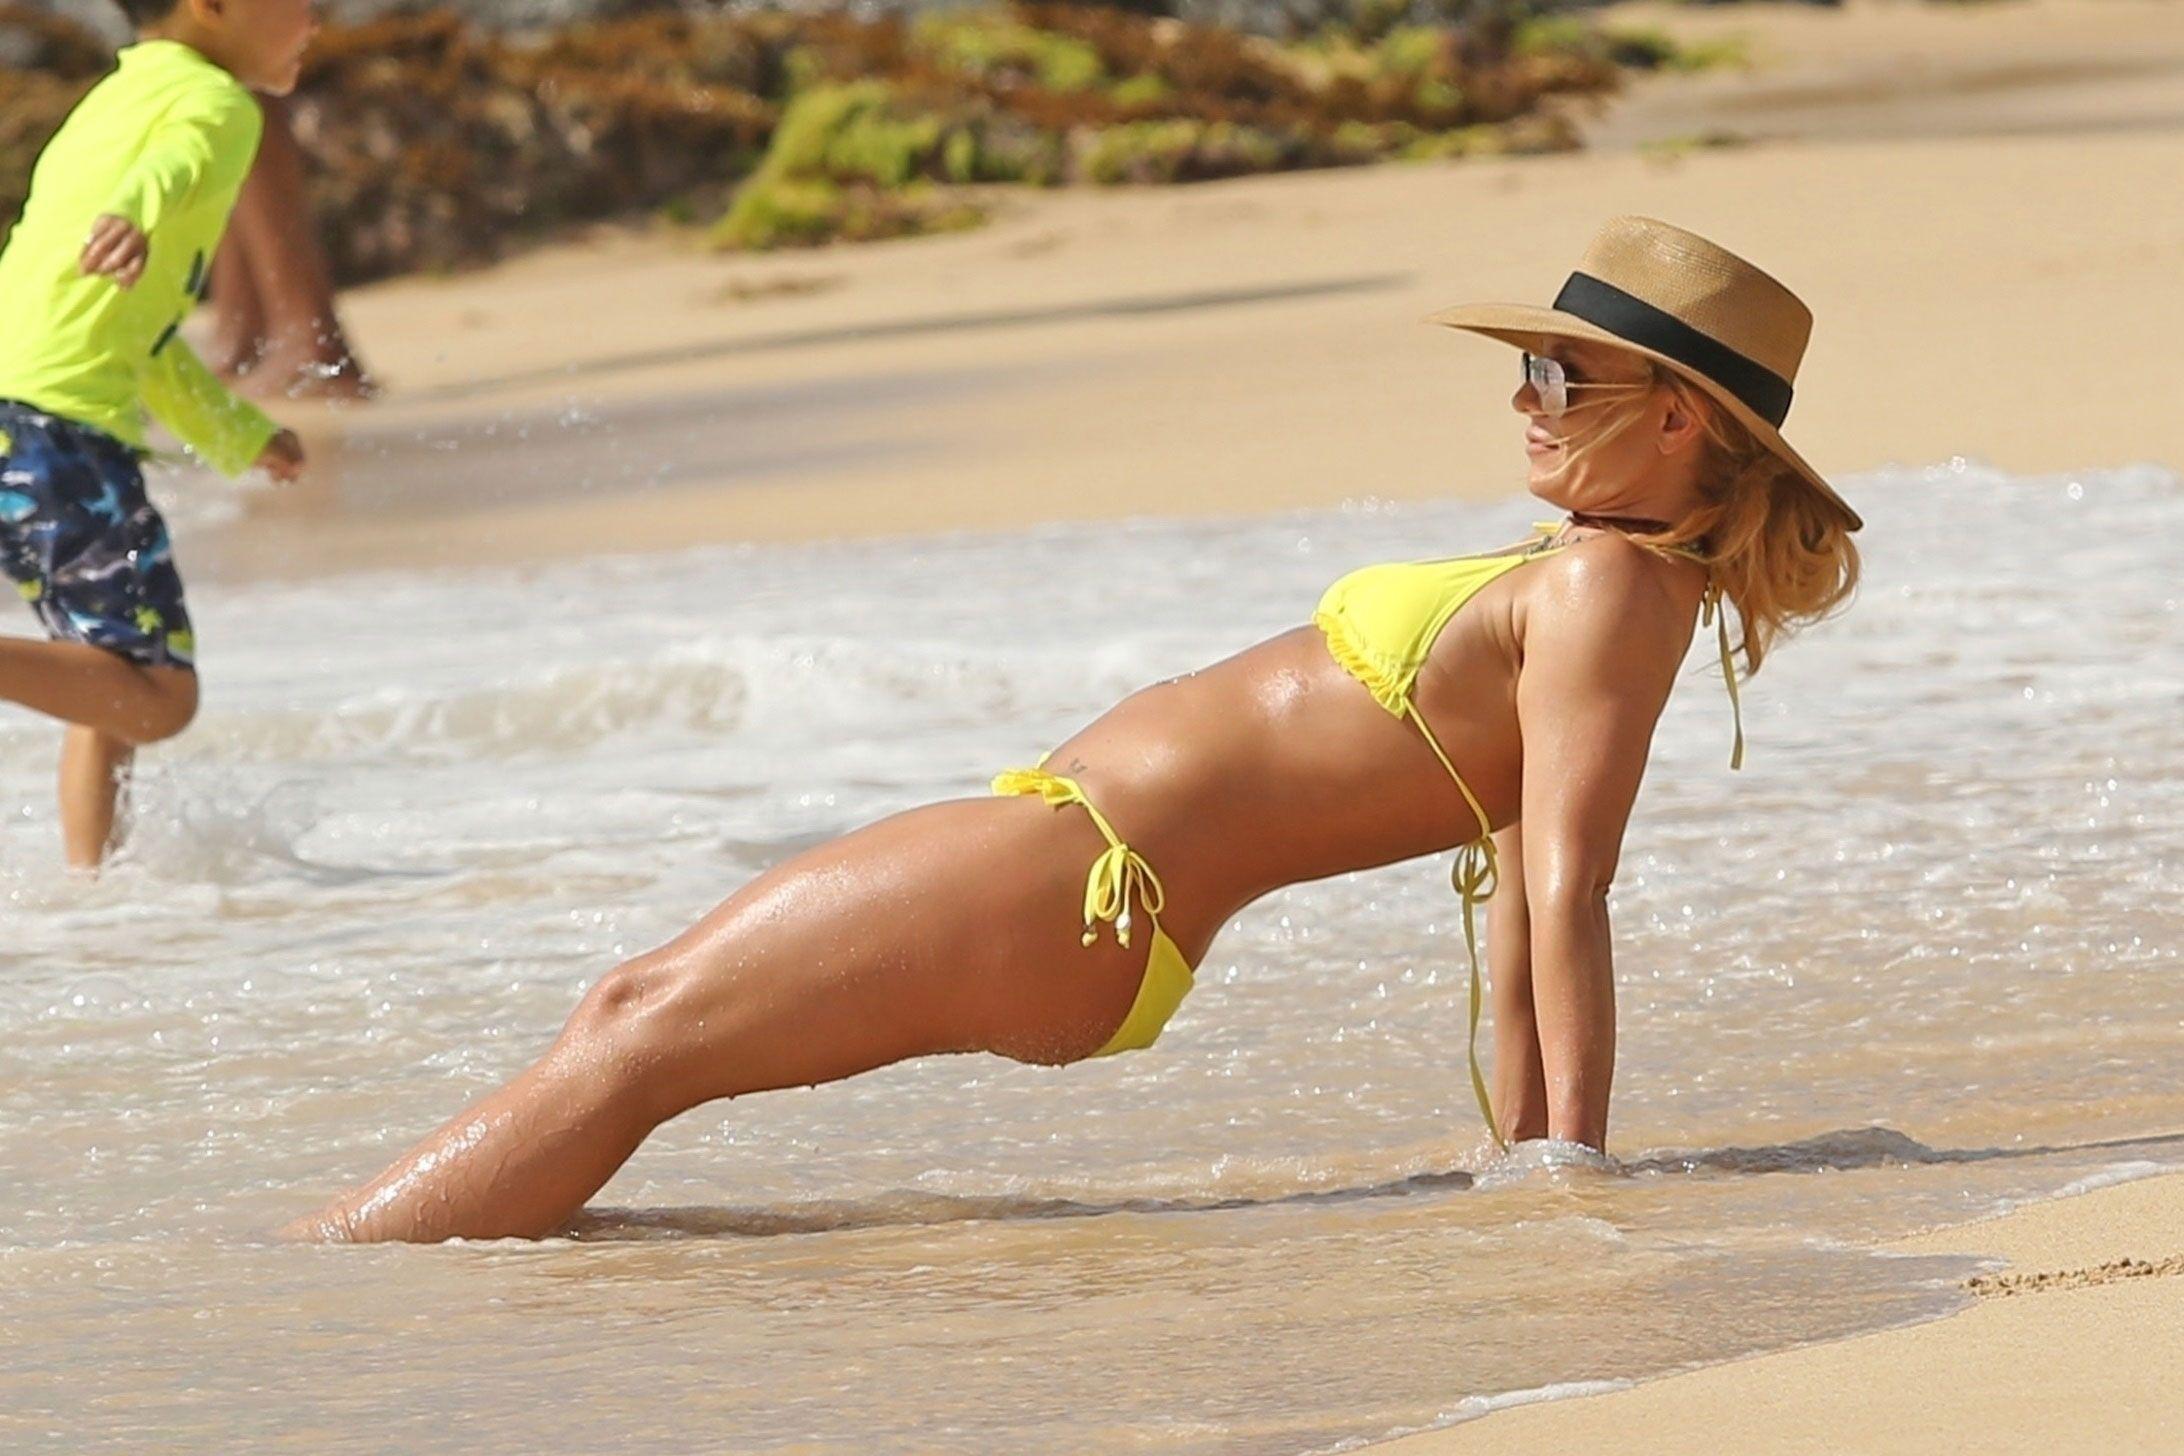 Bikini picture britney spears